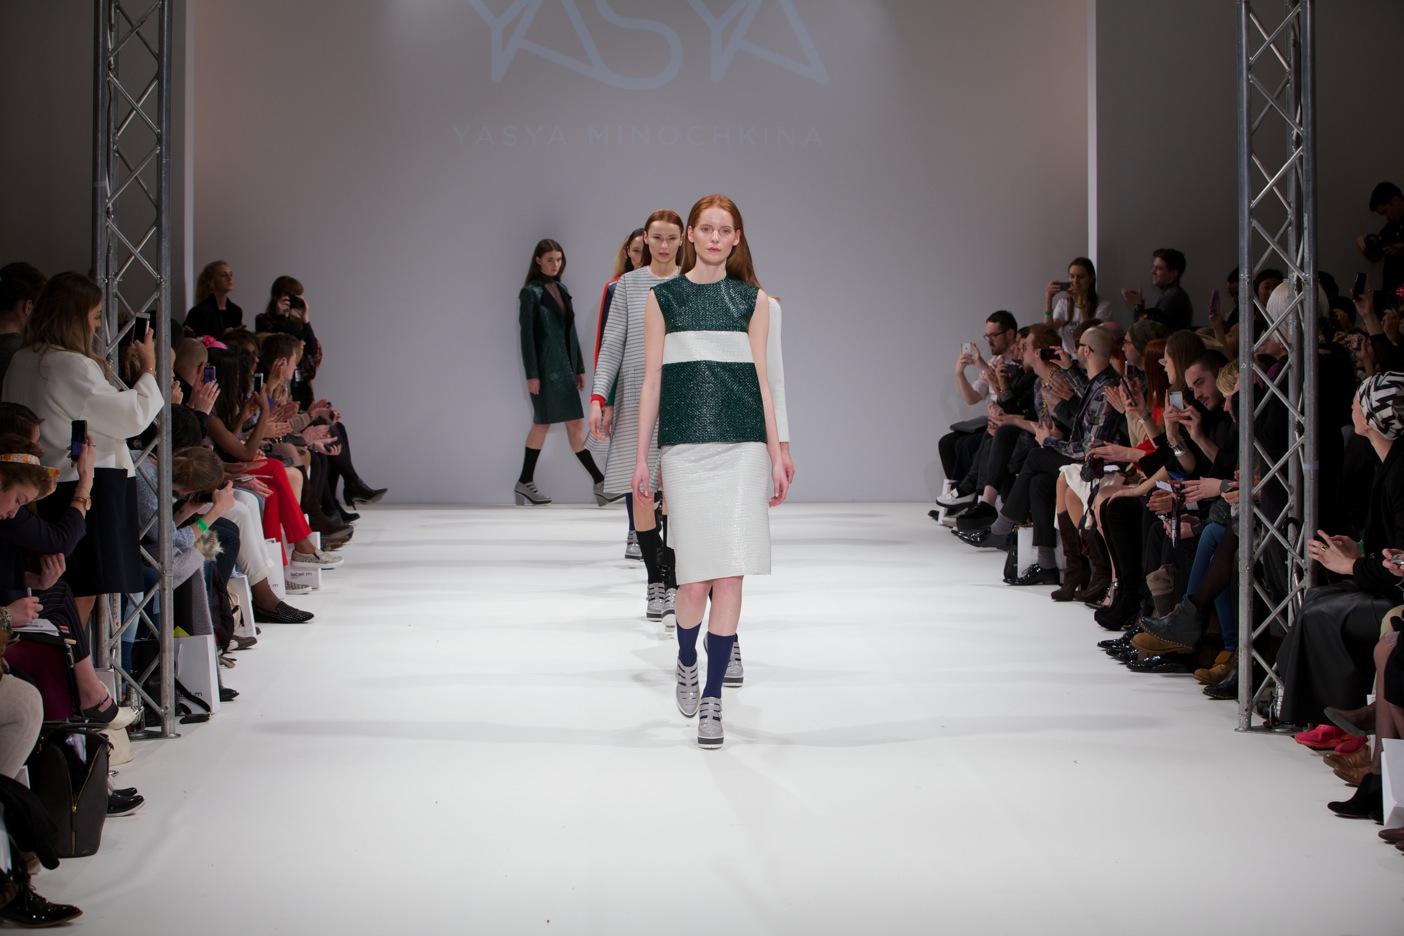 Kiev Fashion Days A-W 2014 (c) Marc aitken 2014  80.jpg